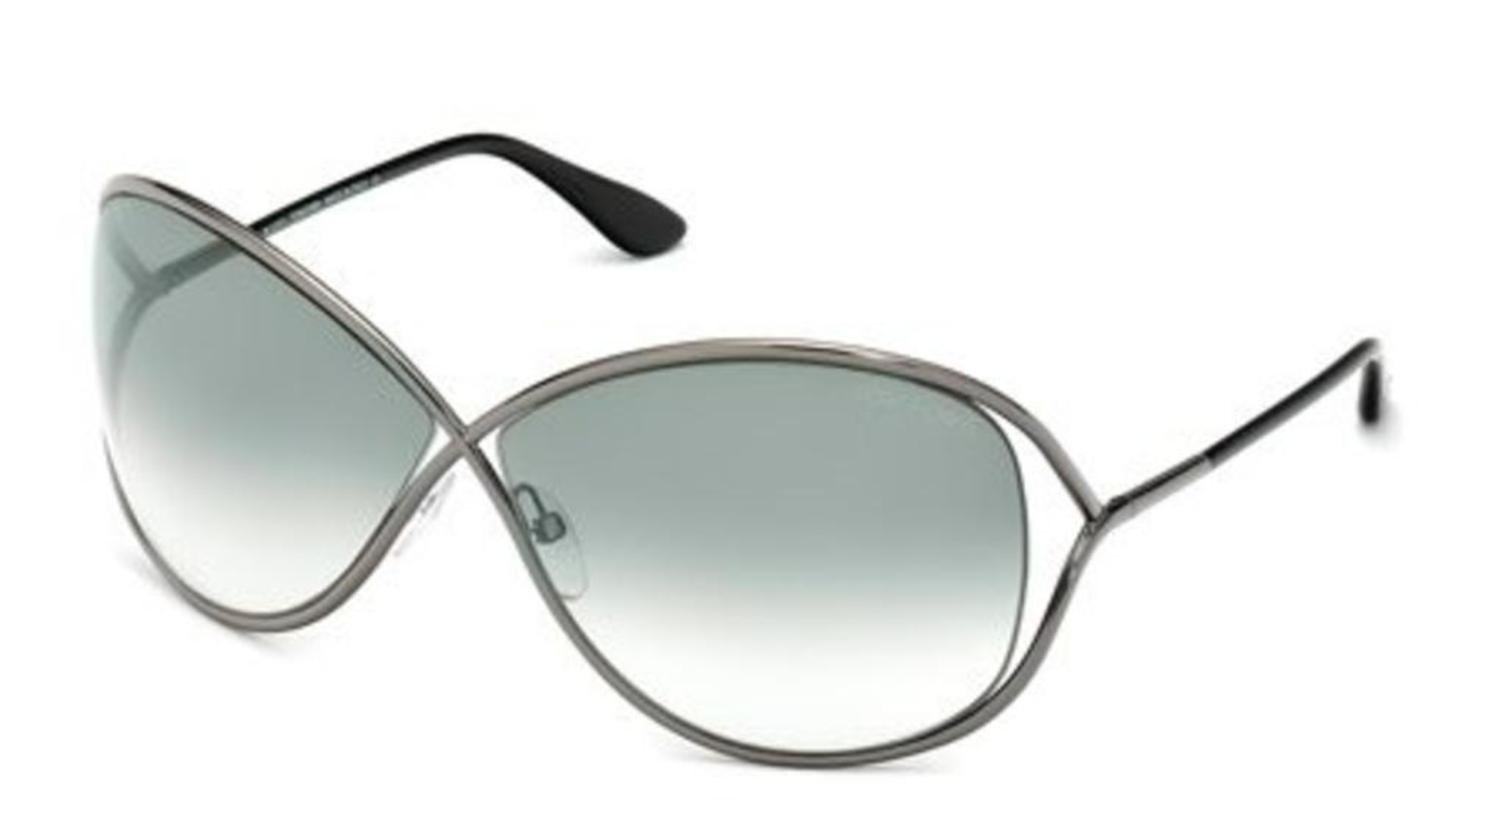 TOM FORD MIRANDA TF130 color 08B Sunglasses by Tom Ford